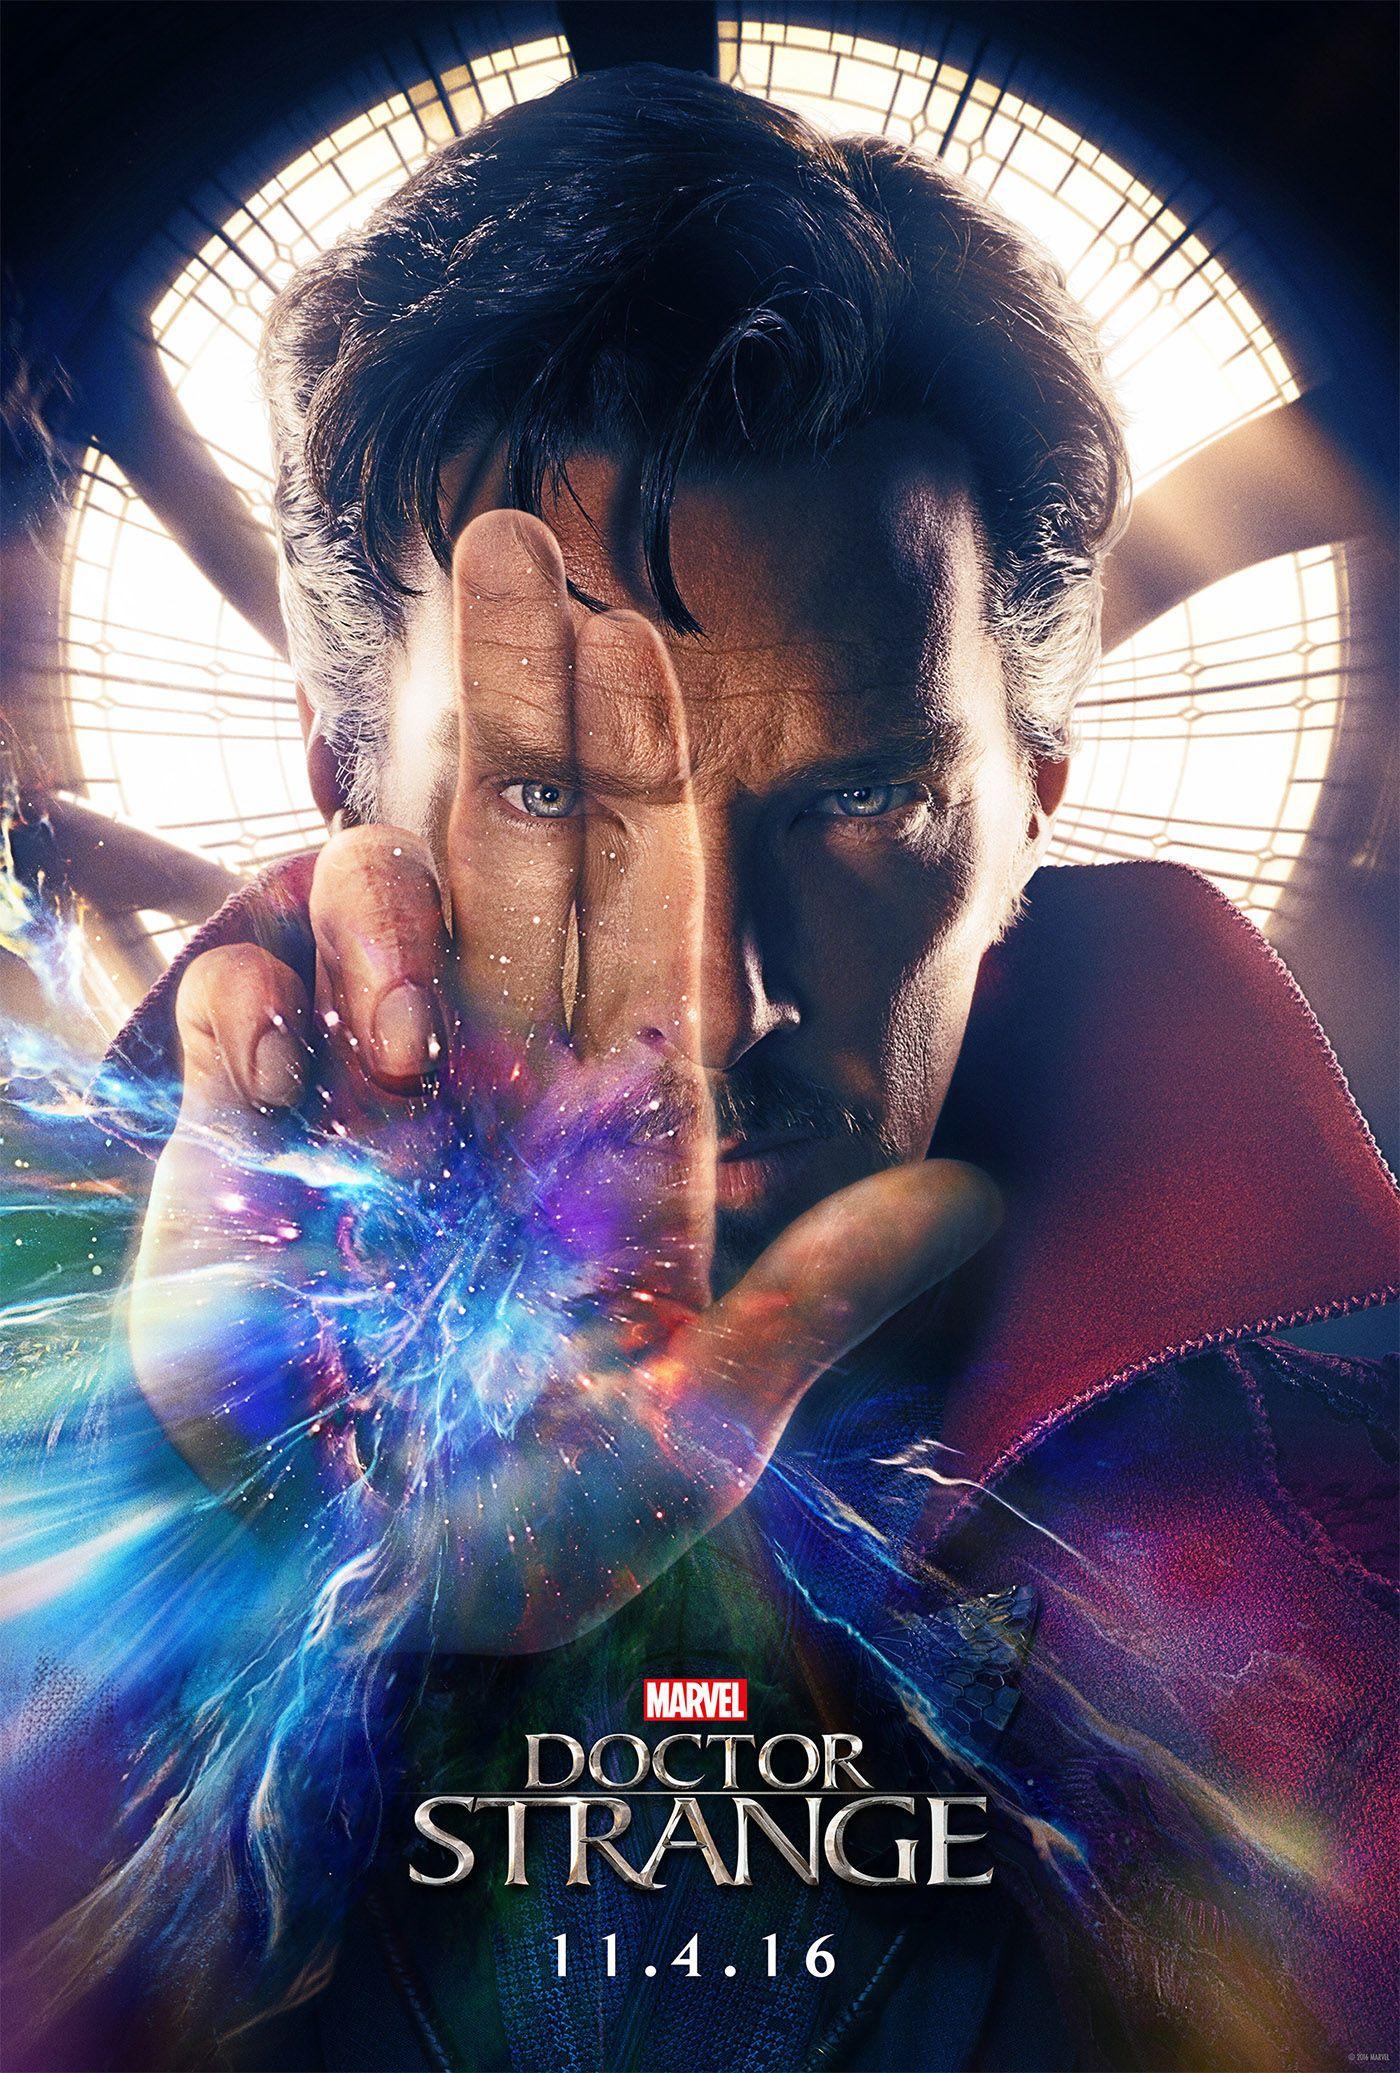 Movies To Come 2016 2017 2018 2019 2020 2021 2022 2023 Album On Imgur Doctor Strange Poster Doctor Strange Marvel Marvel Movie Posters